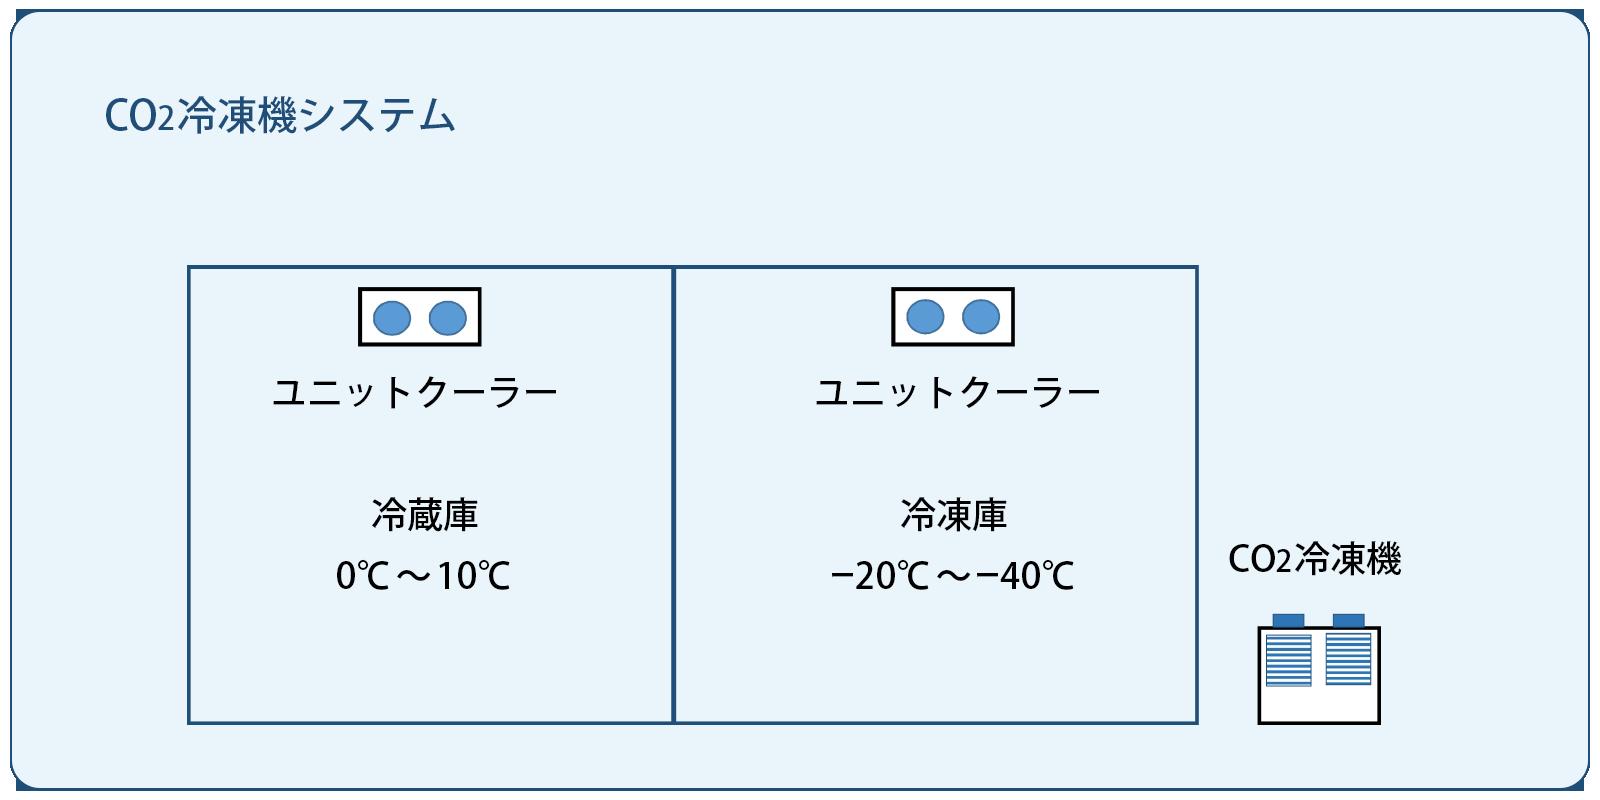 CO2冷凍機システム